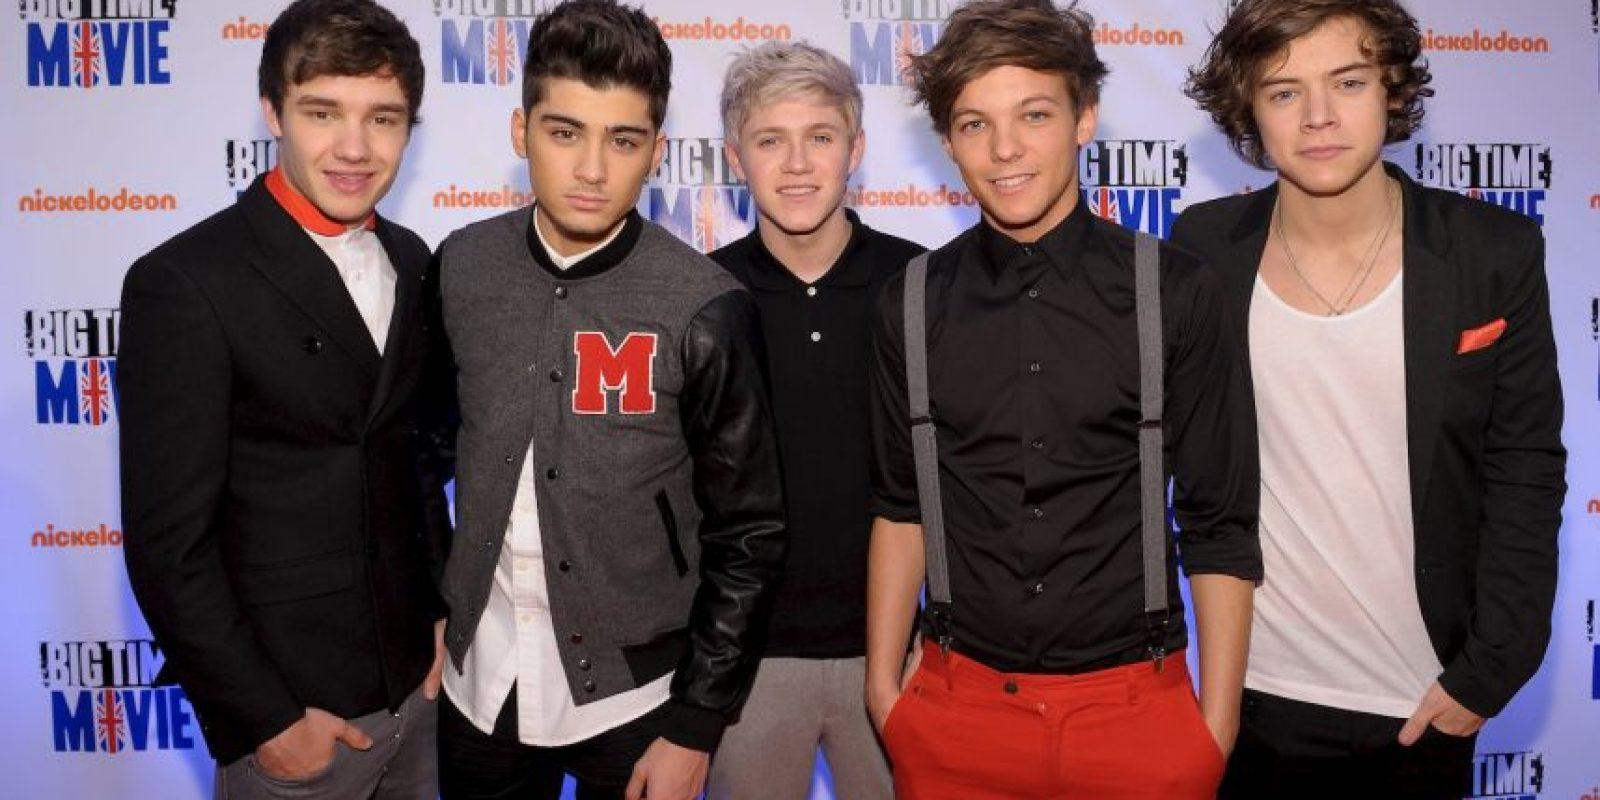 Esta compuesto por Niall Horan, Zayn Malik, Liam Payne, Harry Styles y Louis Tomlinson Foto:Getty Images